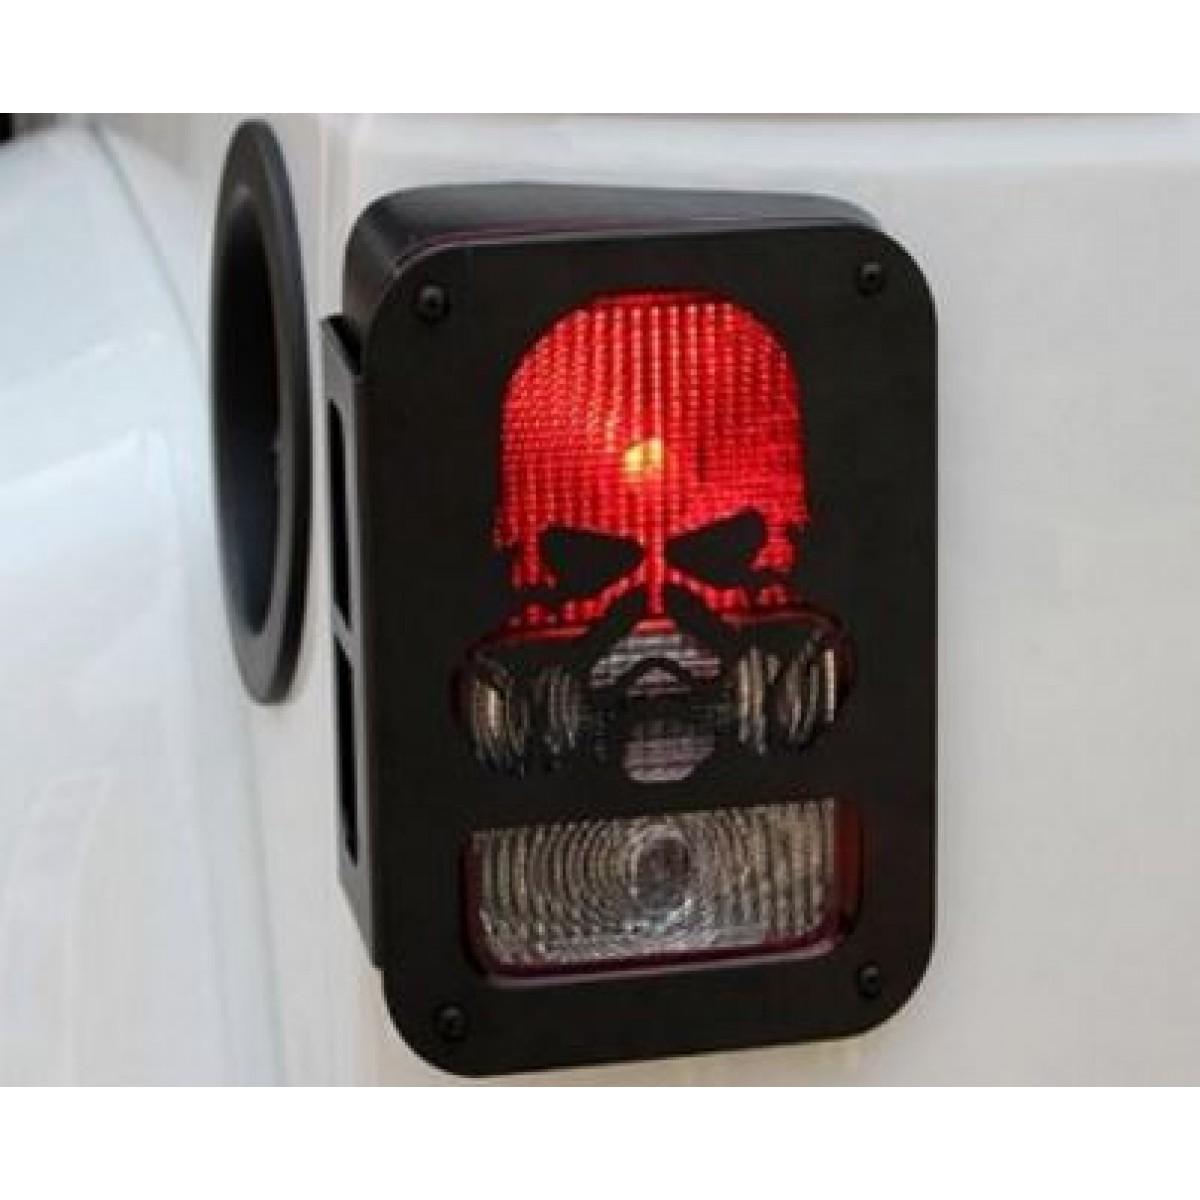 Skull Taillight Cover